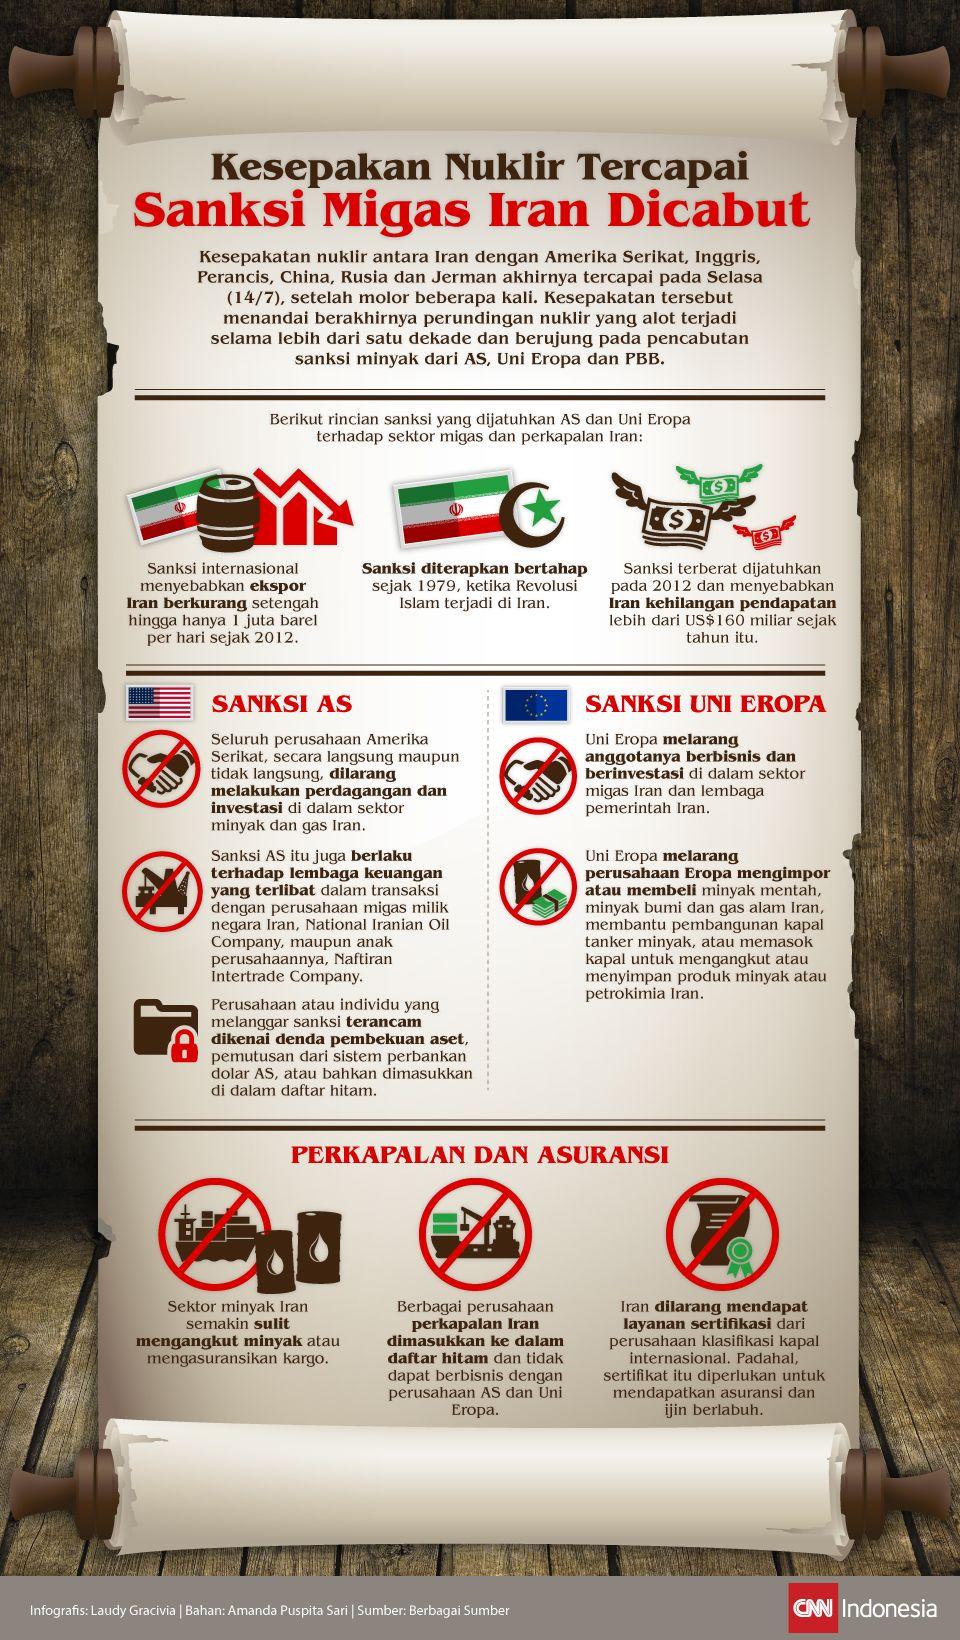 Infografis Kesepakatan Nuklir iran